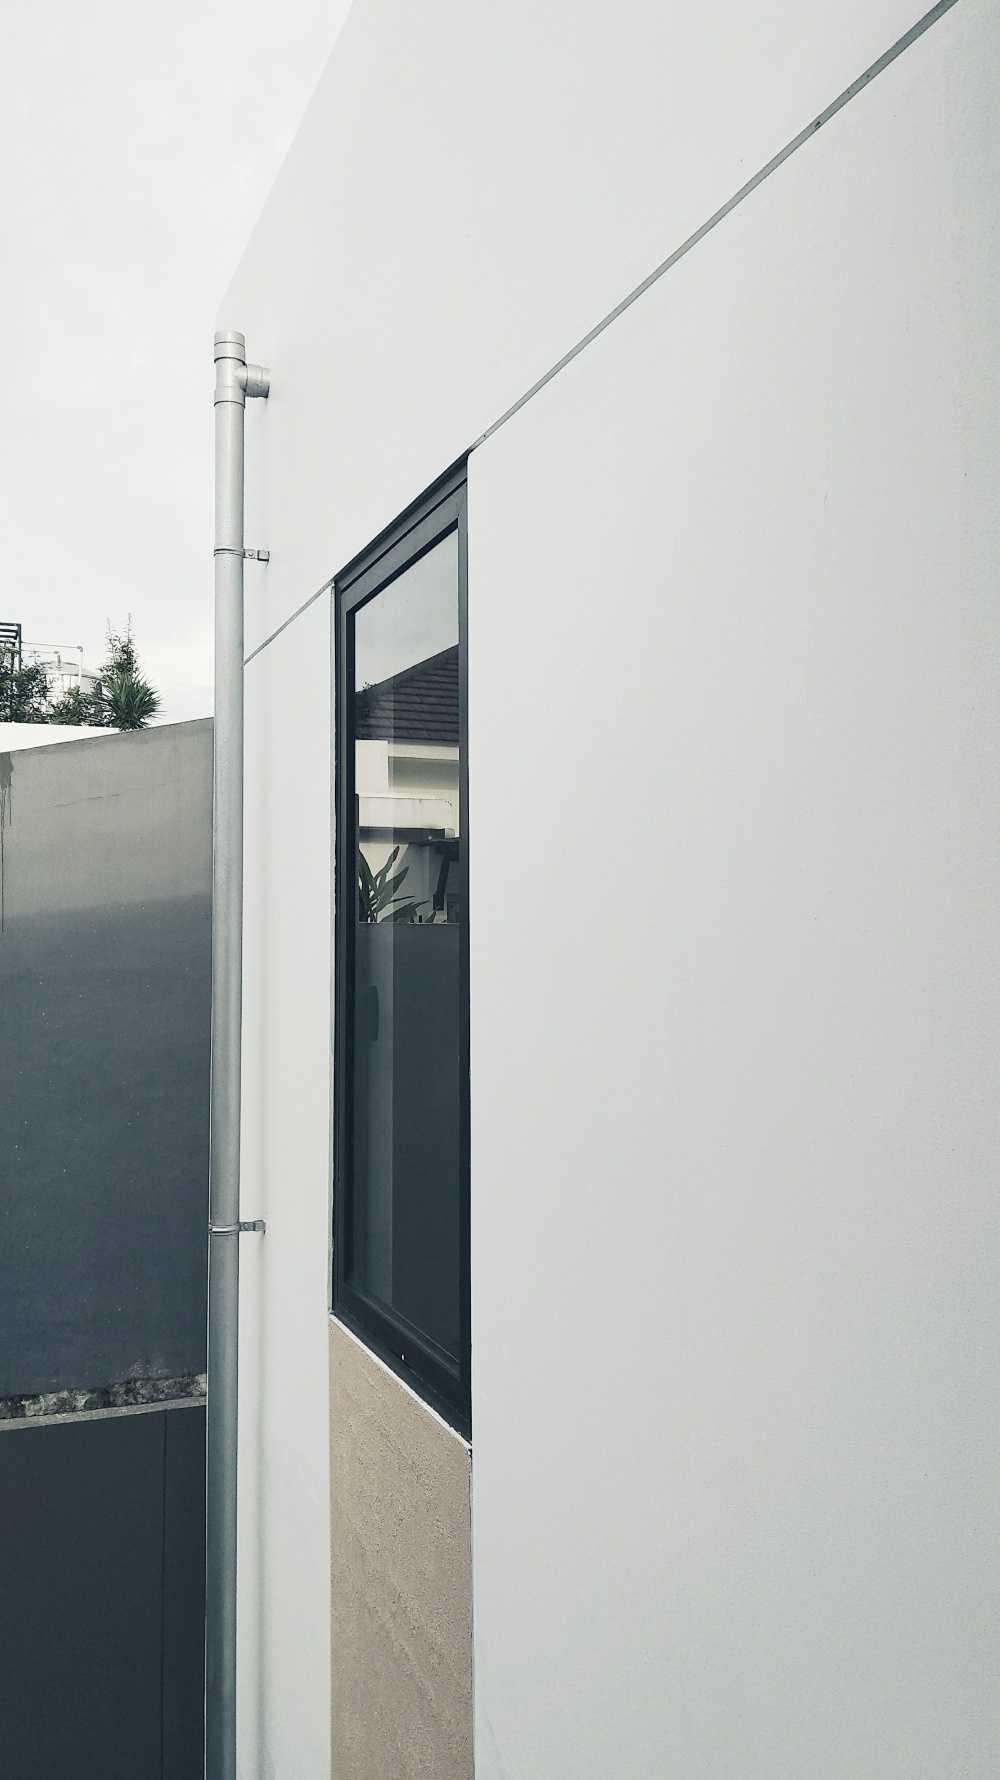 Studio Saya Aei27 House Renovation Jl. Jalur Sutera, Kunciran, Pinang, Kota Tangerang, Banten 15143, Indonesia Jl. Jalur Sutera, Kunciran, Pinang, Kota Tangerang, Banten 15143, Indonesia Studio-S-A-Y-A-Aei27-House-Renovation  60996